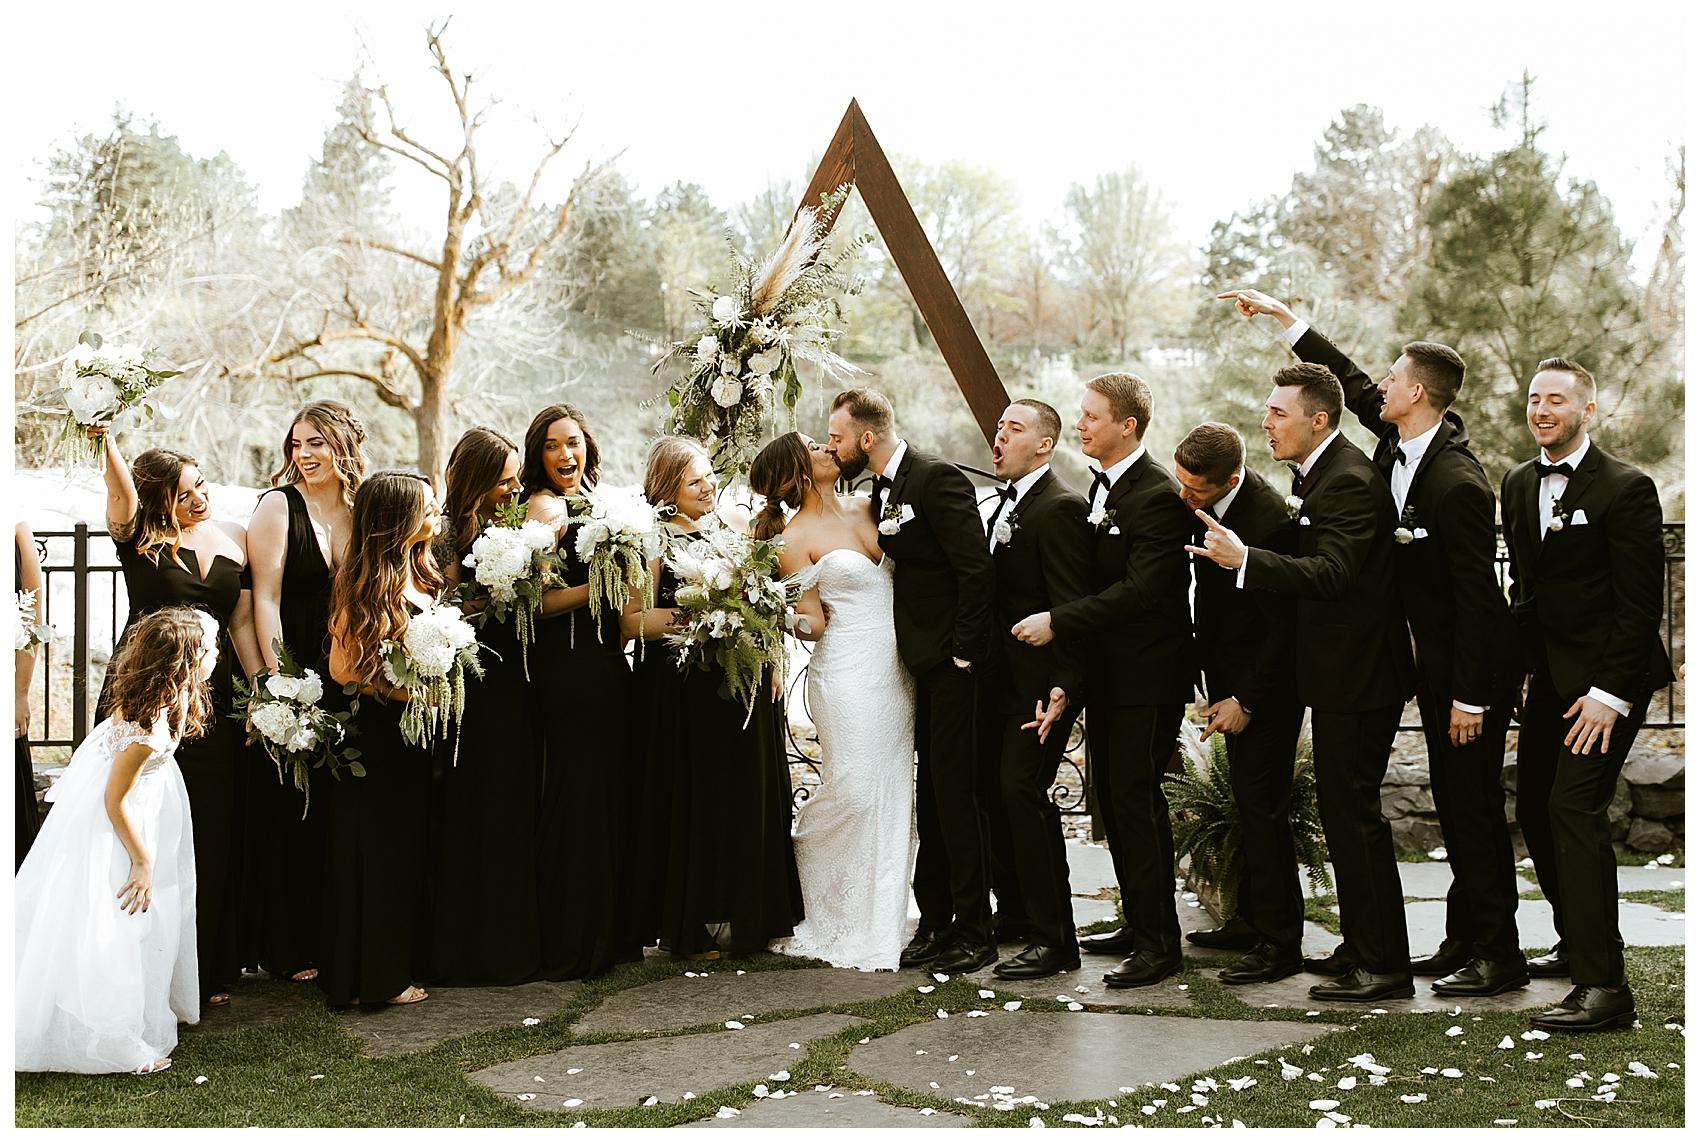 Chateau Rive Spokane Wedding Cassie Trottier Photography01065.jpg